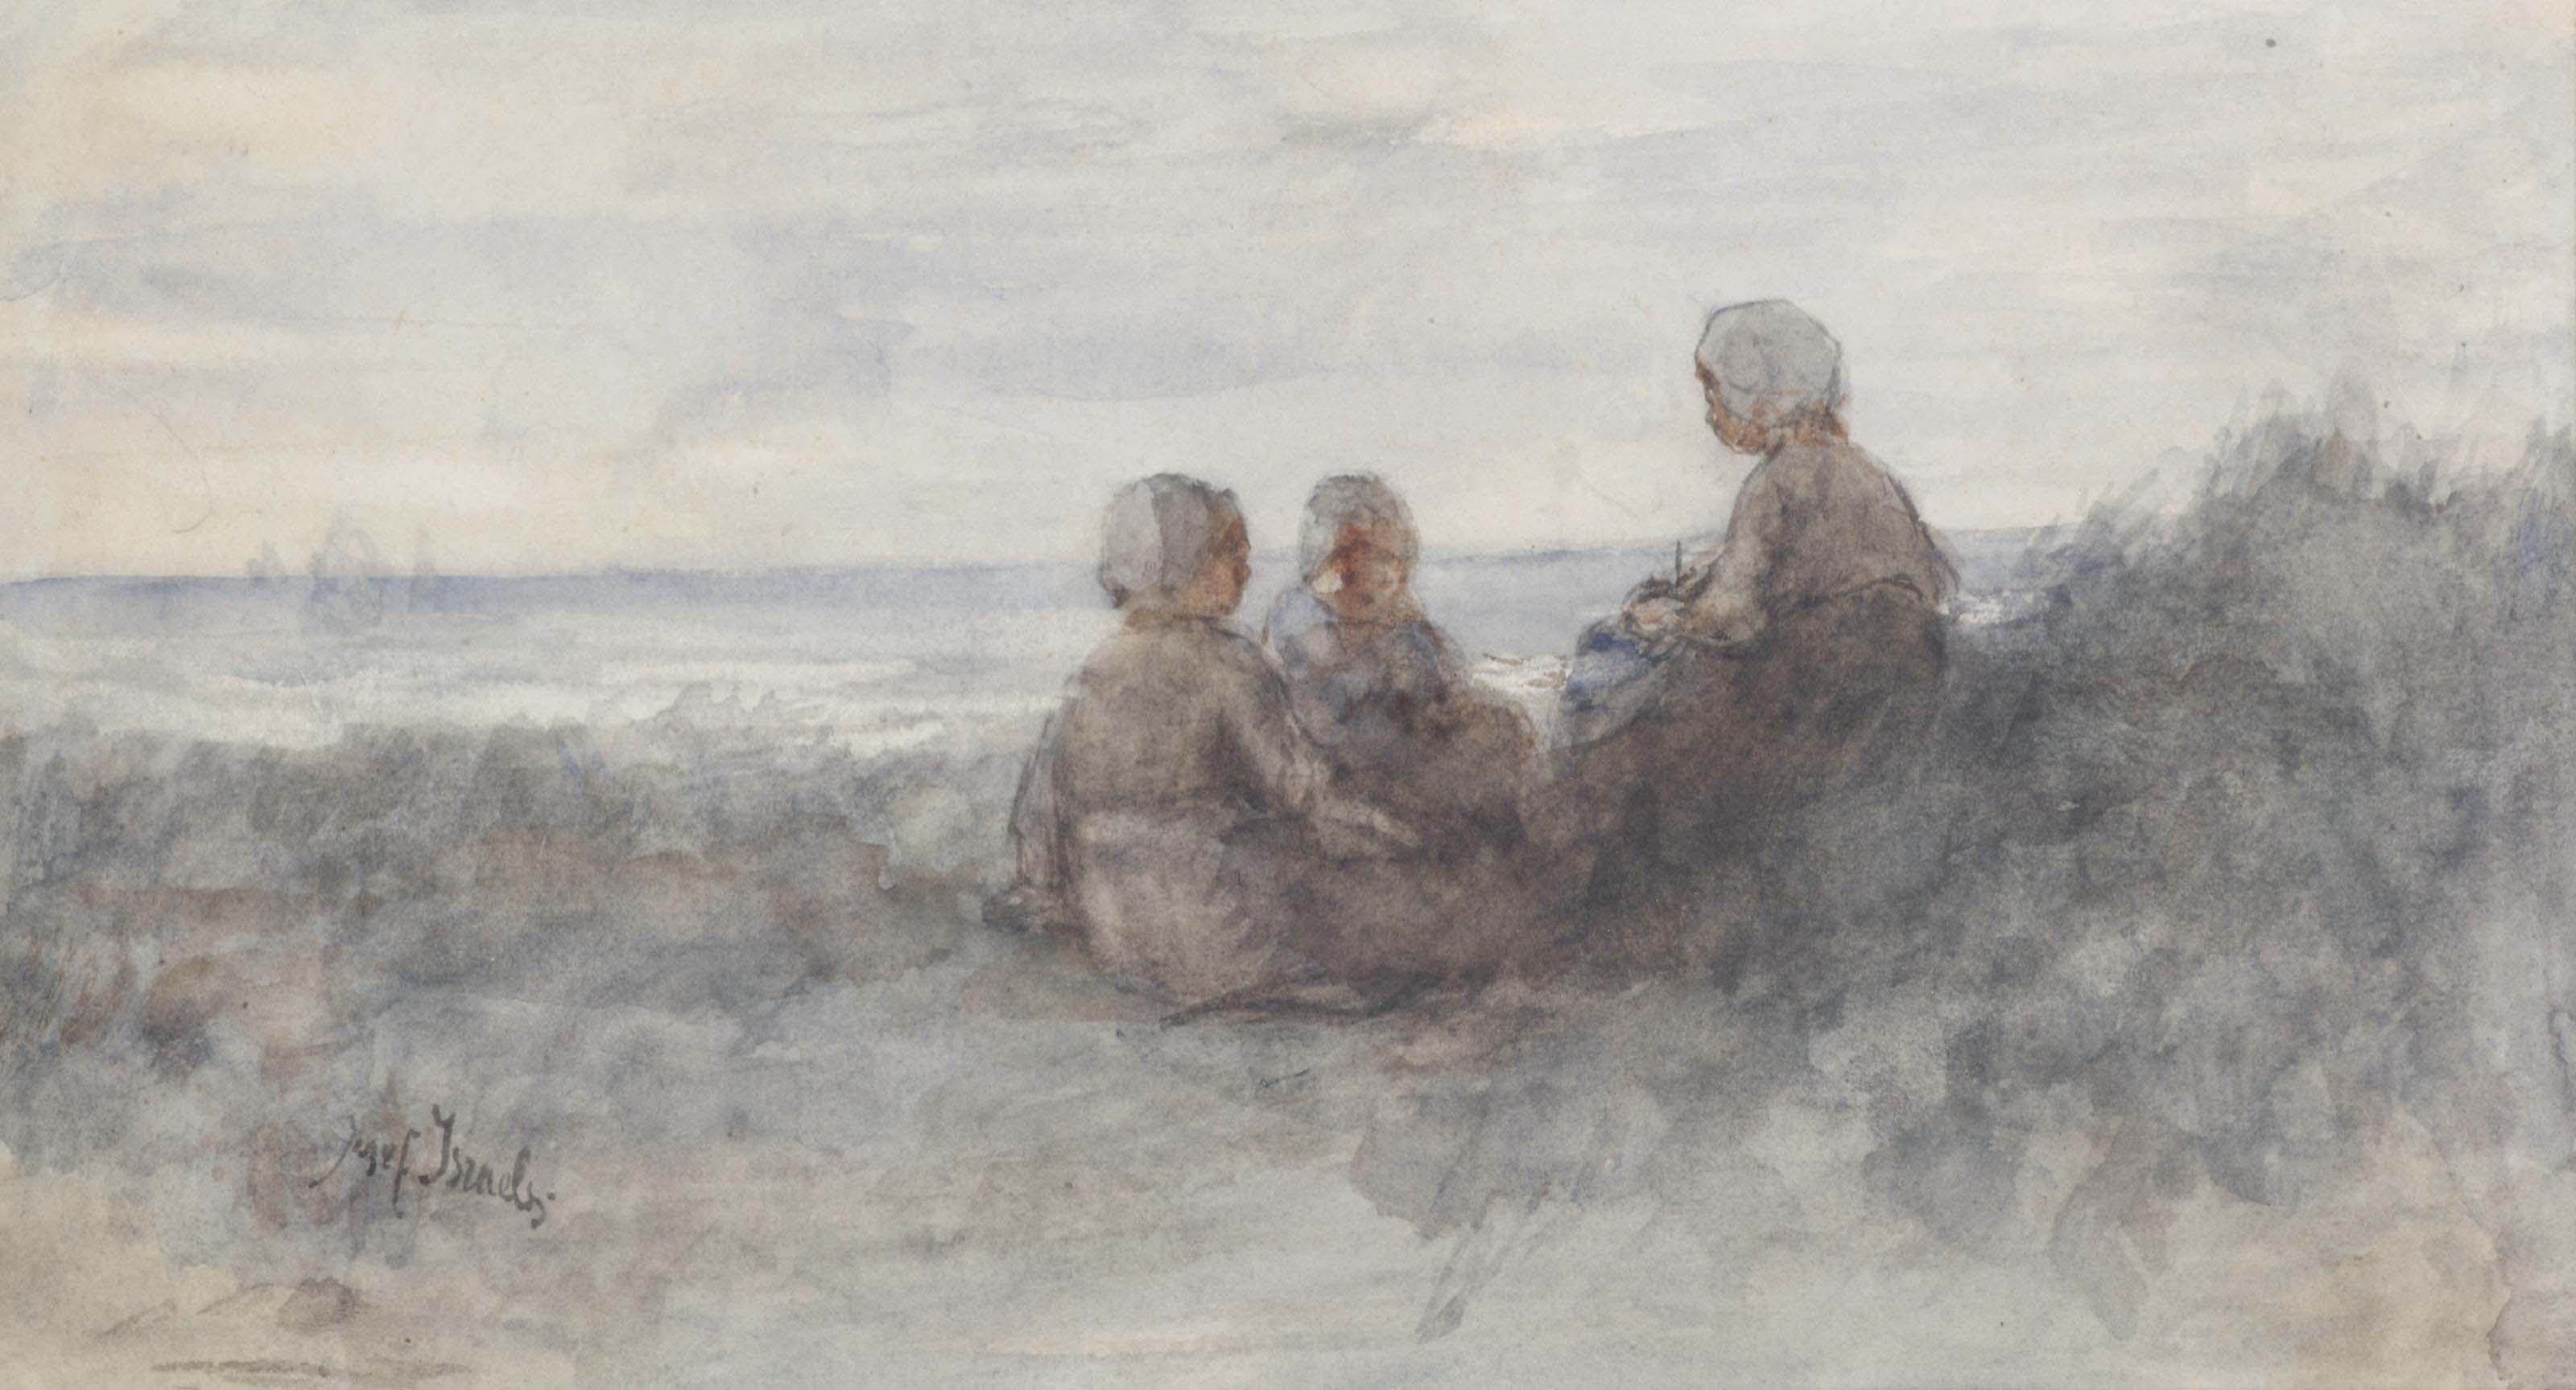 Jozef Israëls (Groningen 1824-